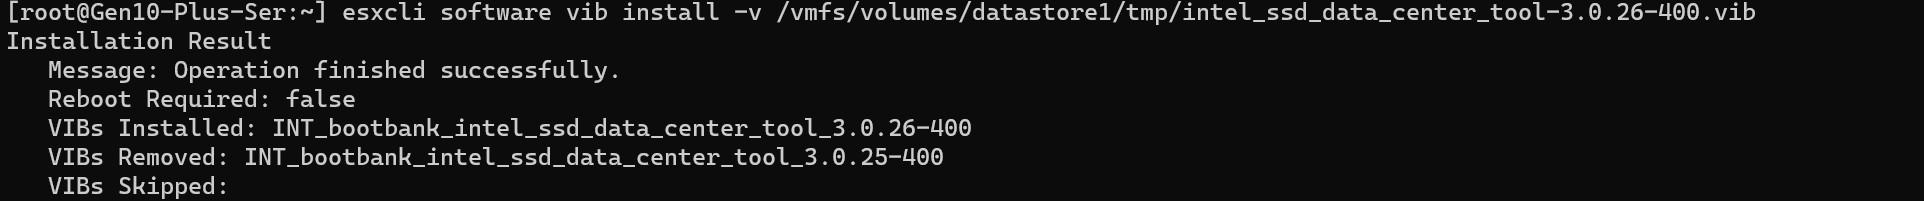 SSD tool install